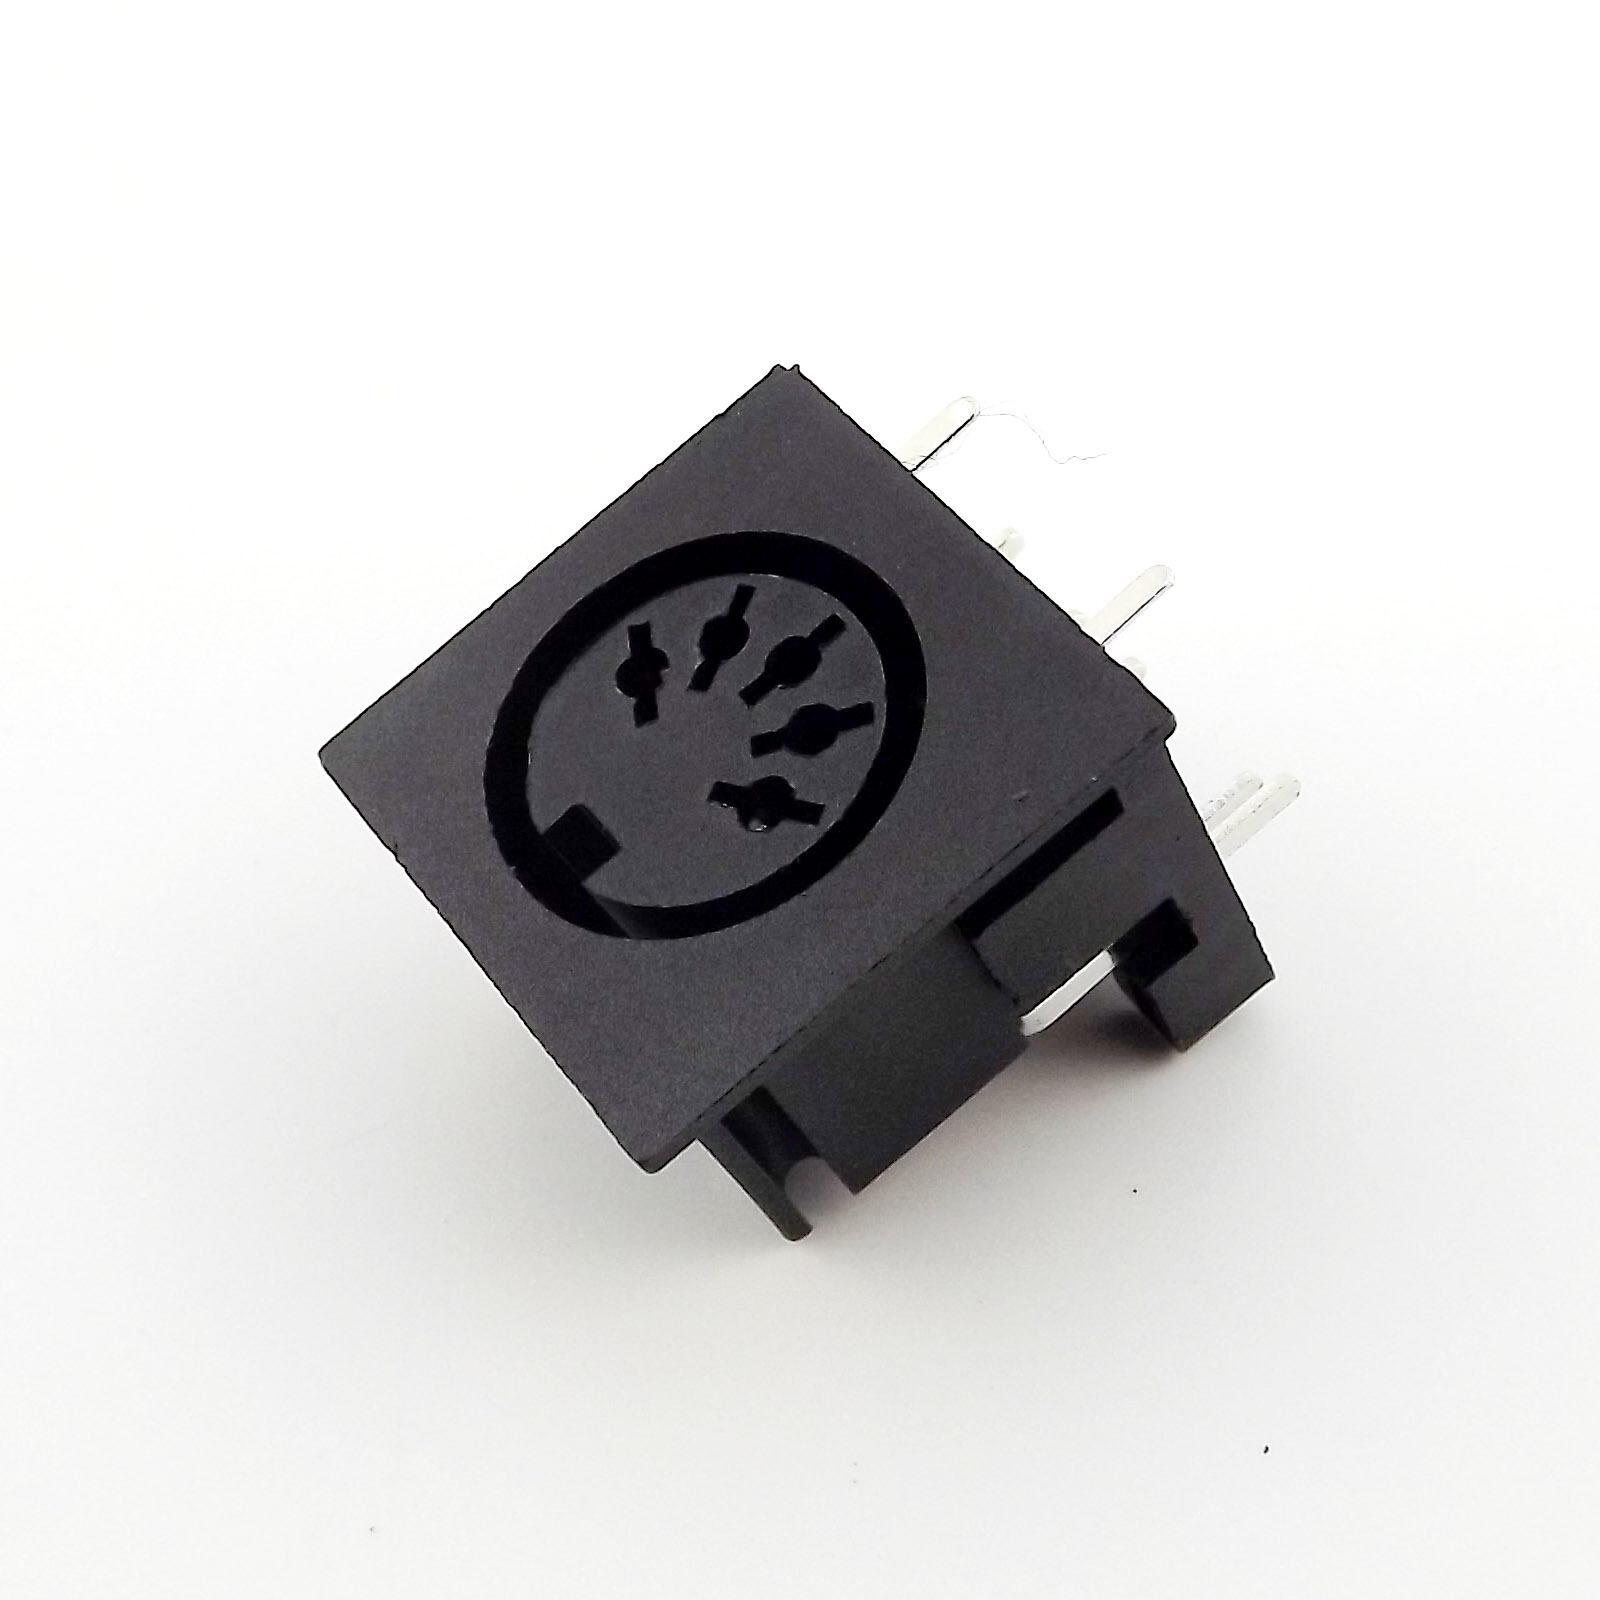 10Pcs DIN 6 Pin Circular Jack Female Panel Mount PCB Mount Connector Adapter B$C